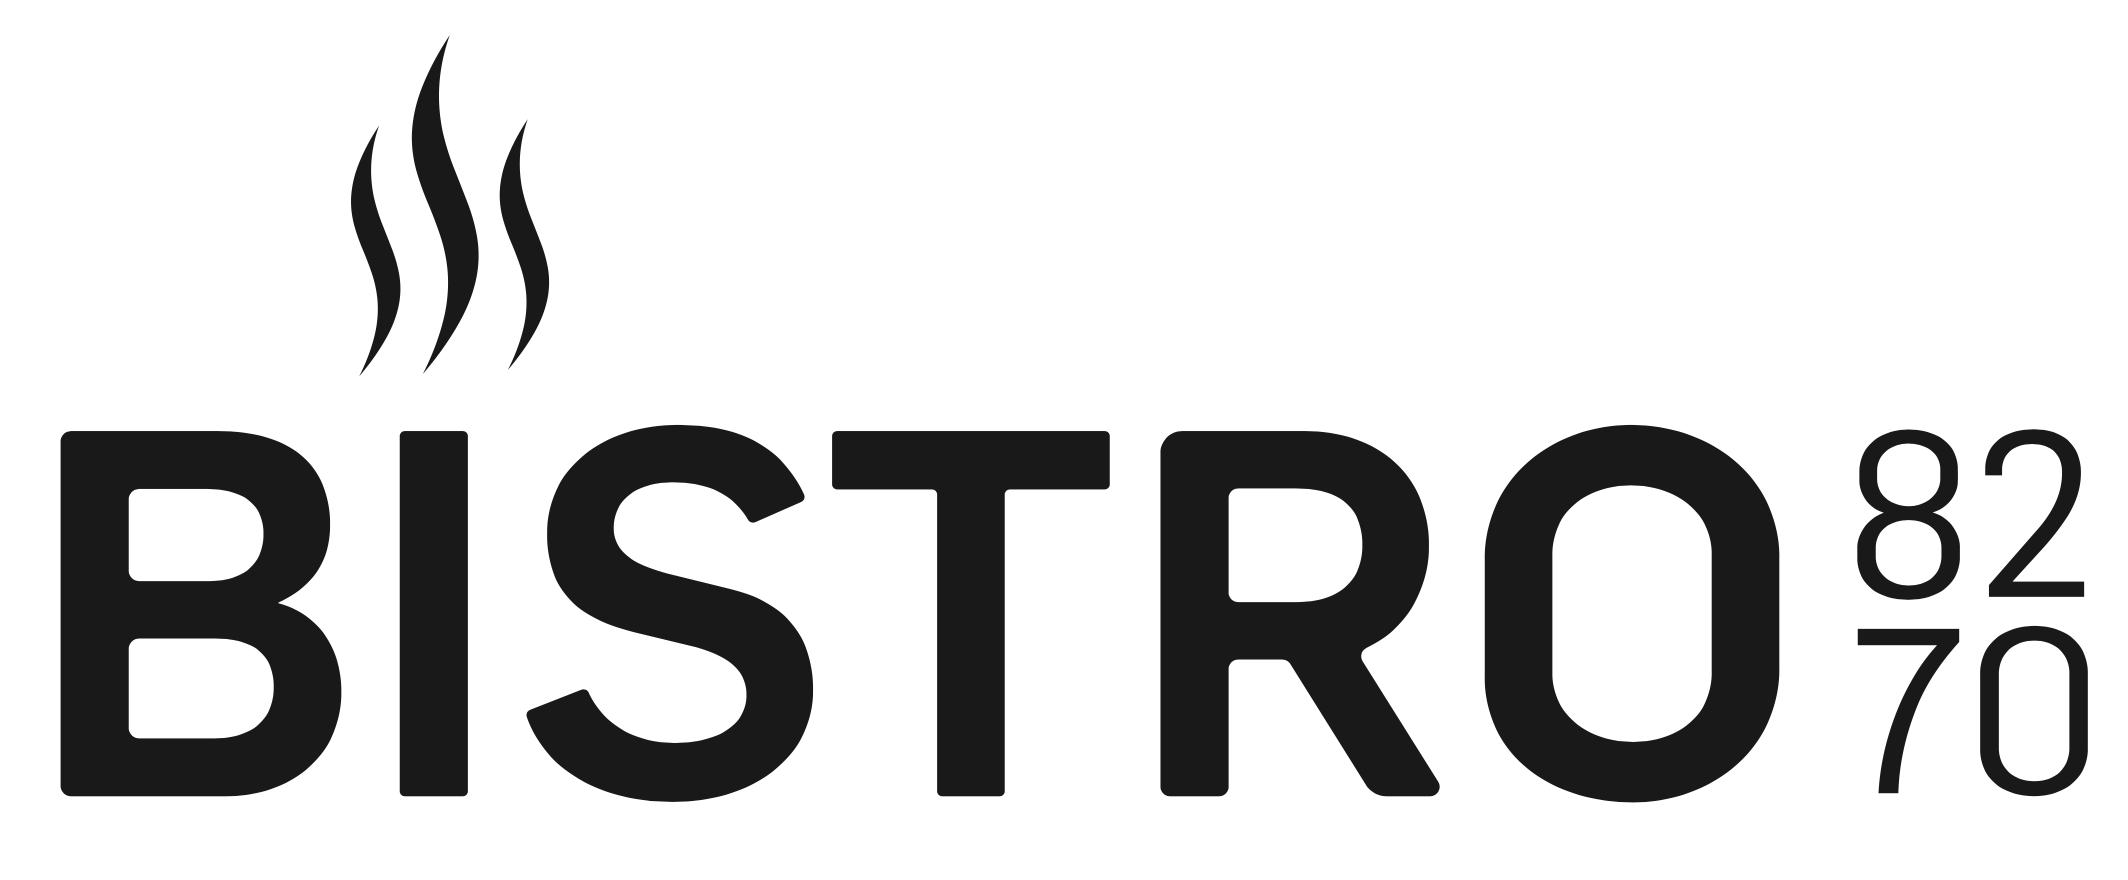 Bistro 8270